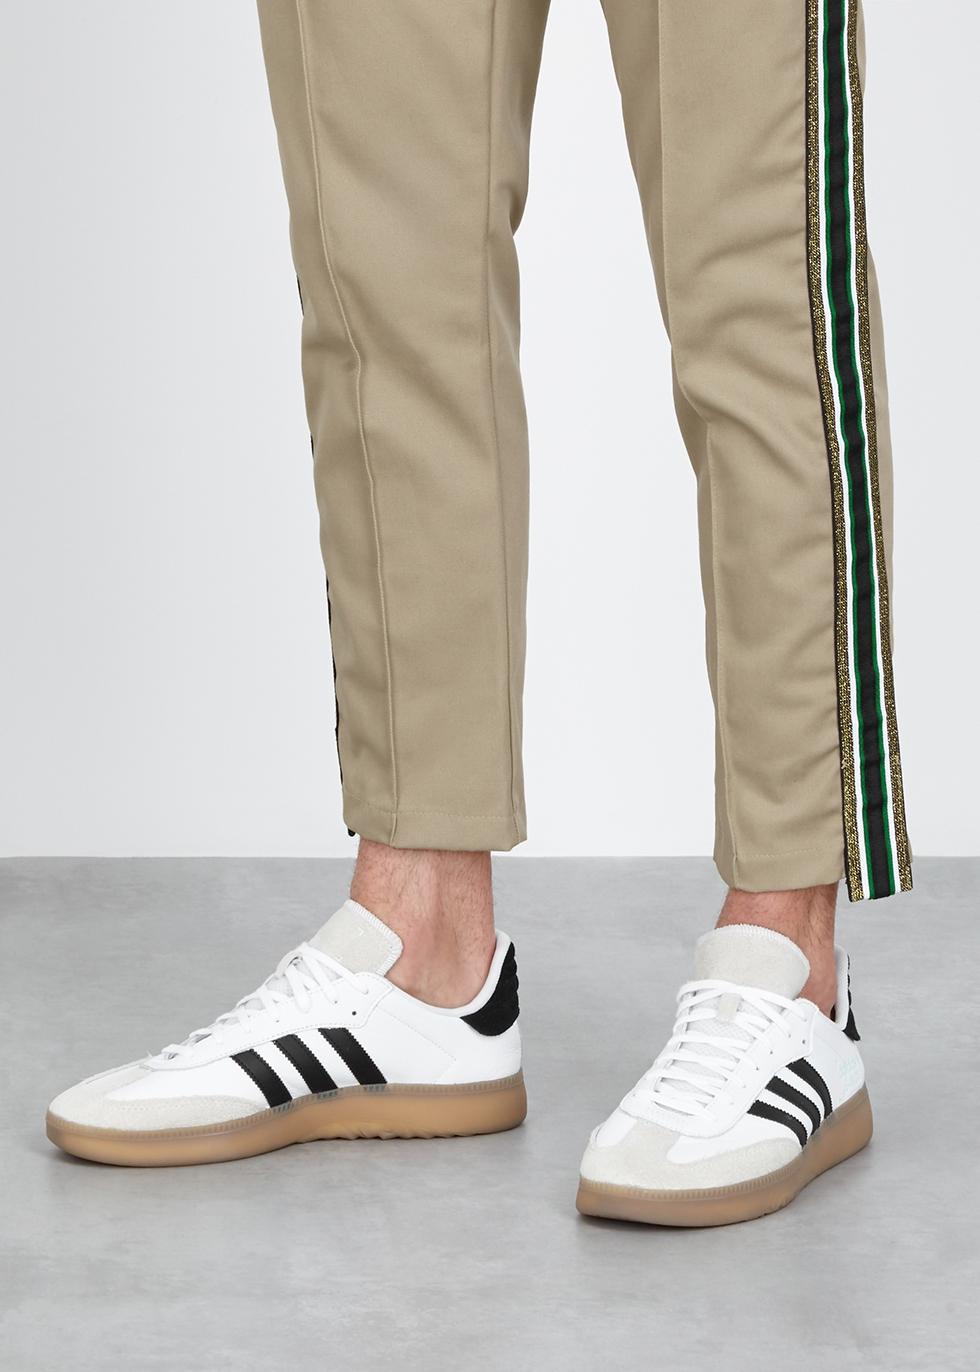 d07a5ff6b0fa72 adidas Originals Samba RM white leather trainers - Harvey Nichols